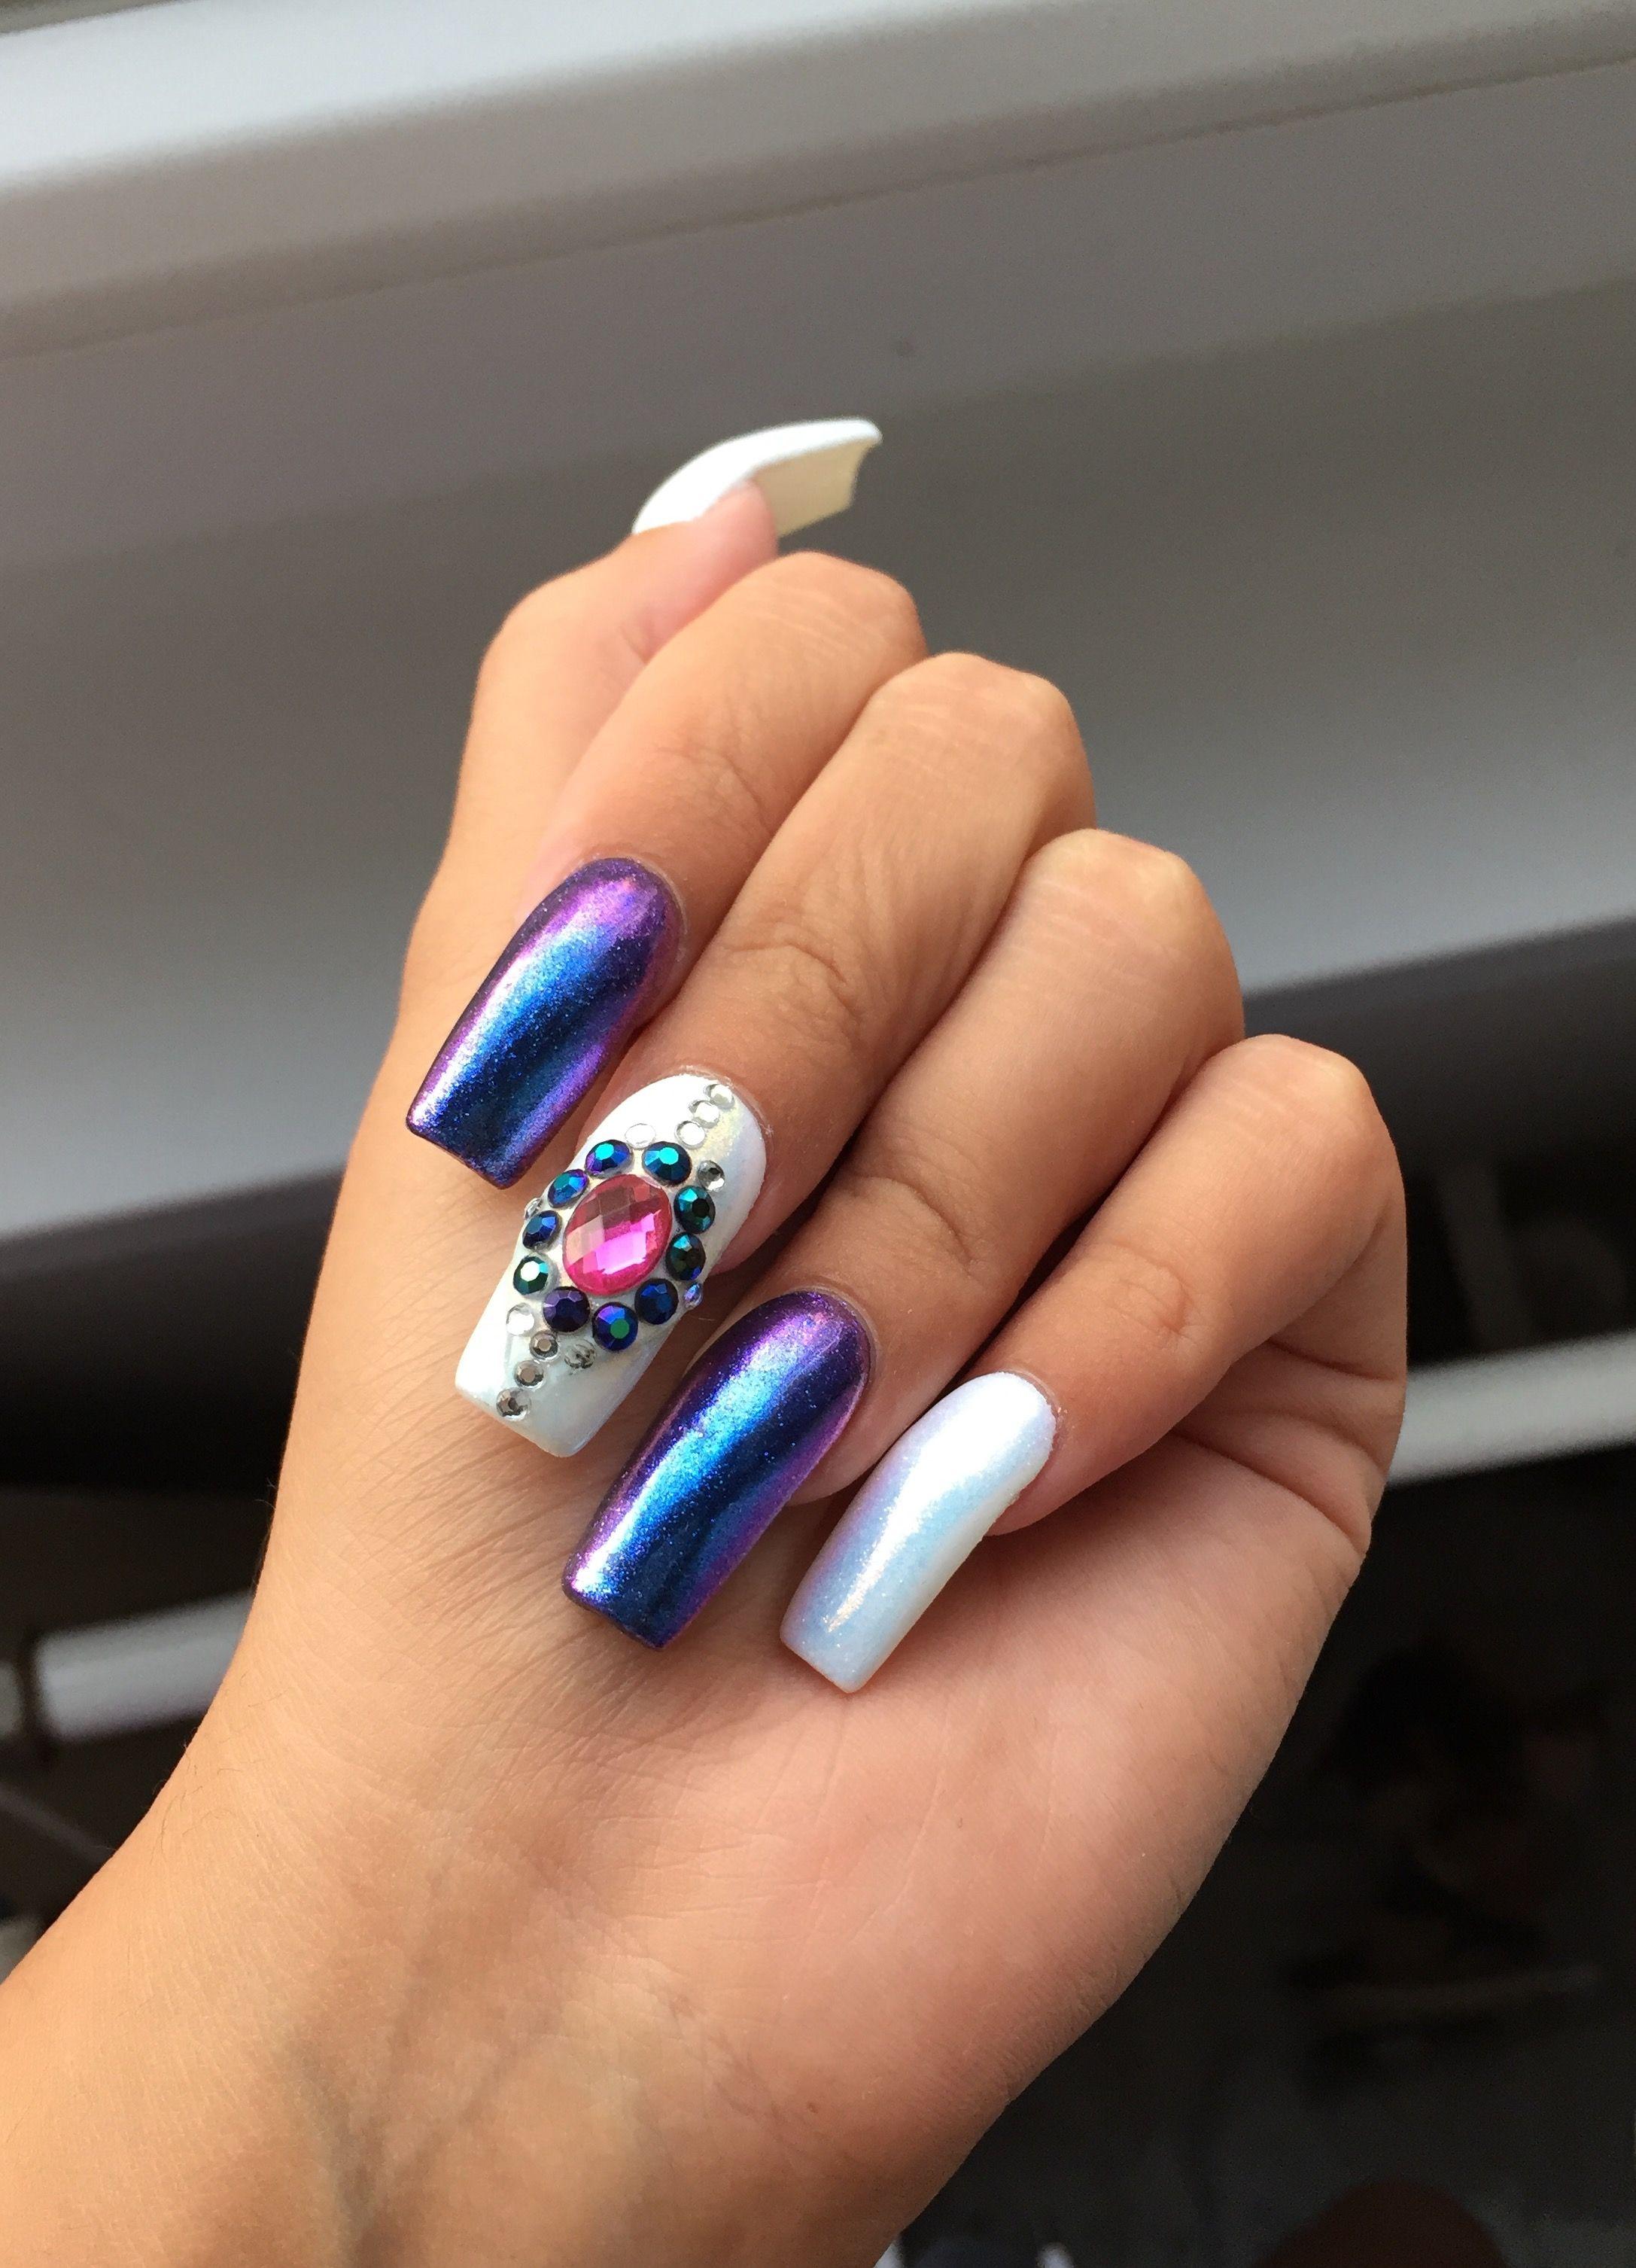 nails #crystals #beauty #chrome #mermaid #aurora #blue #purple ...